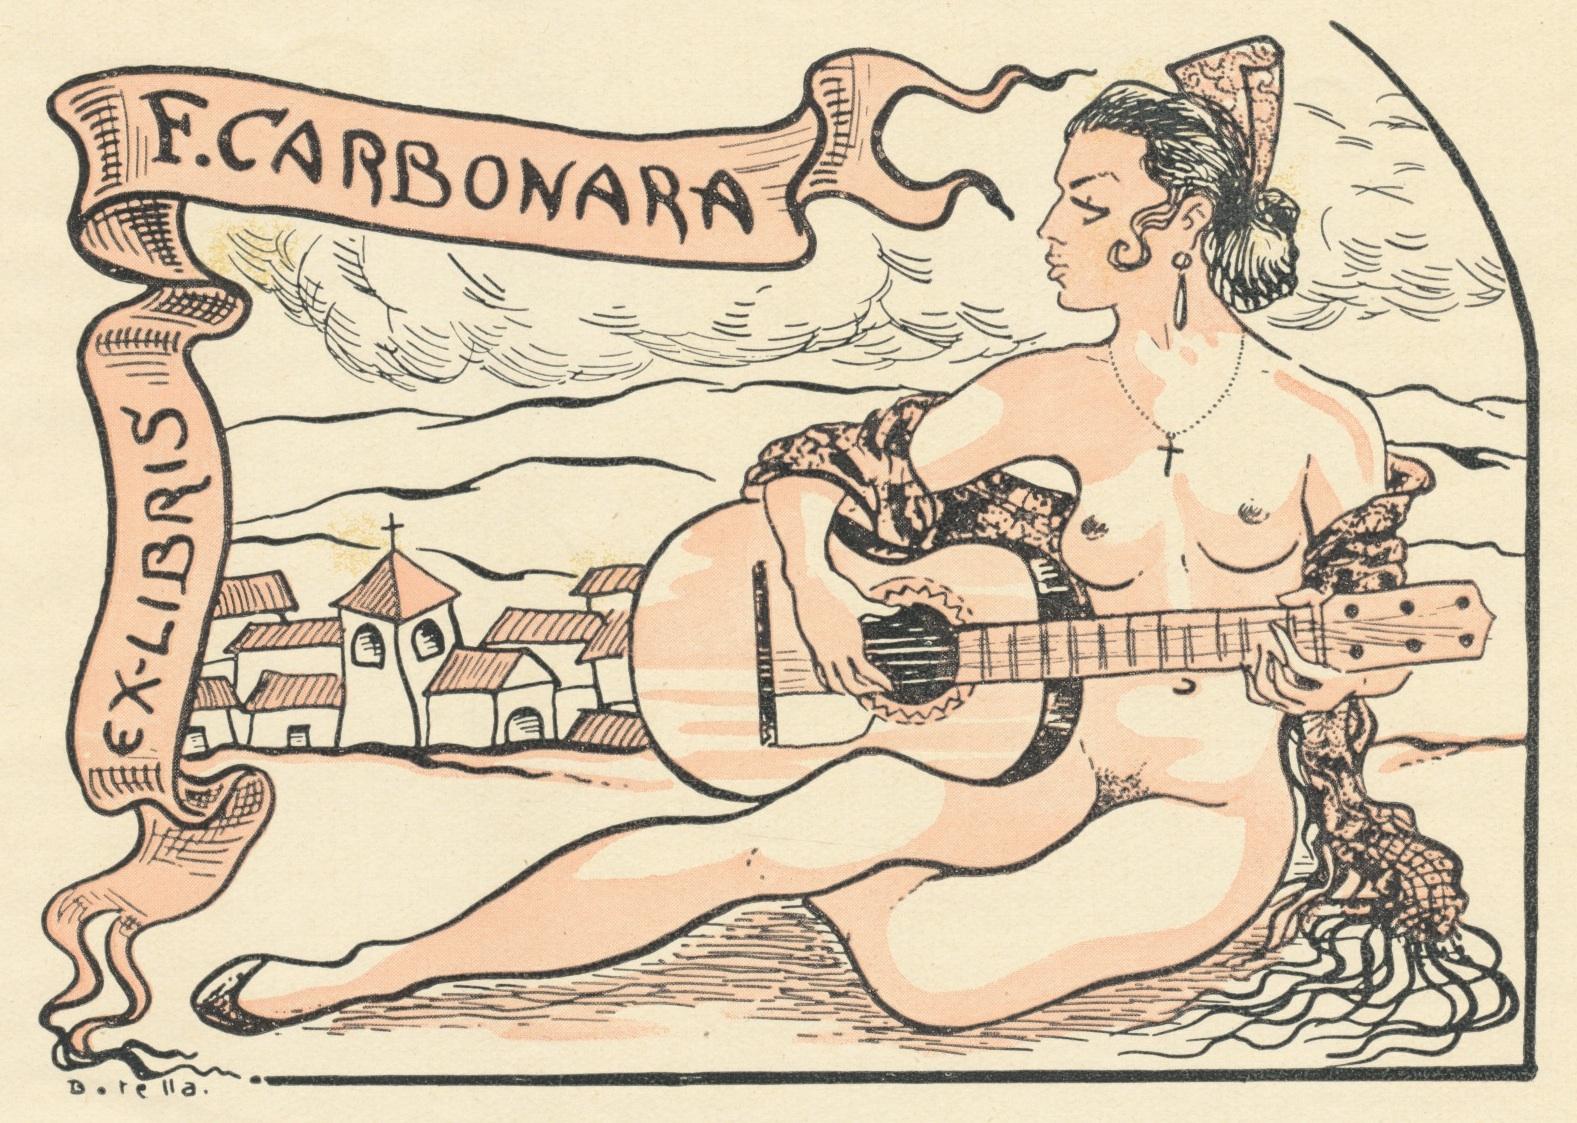 Ex Libris F. Carbonara - Juan Vicente Botella 5 euro 02